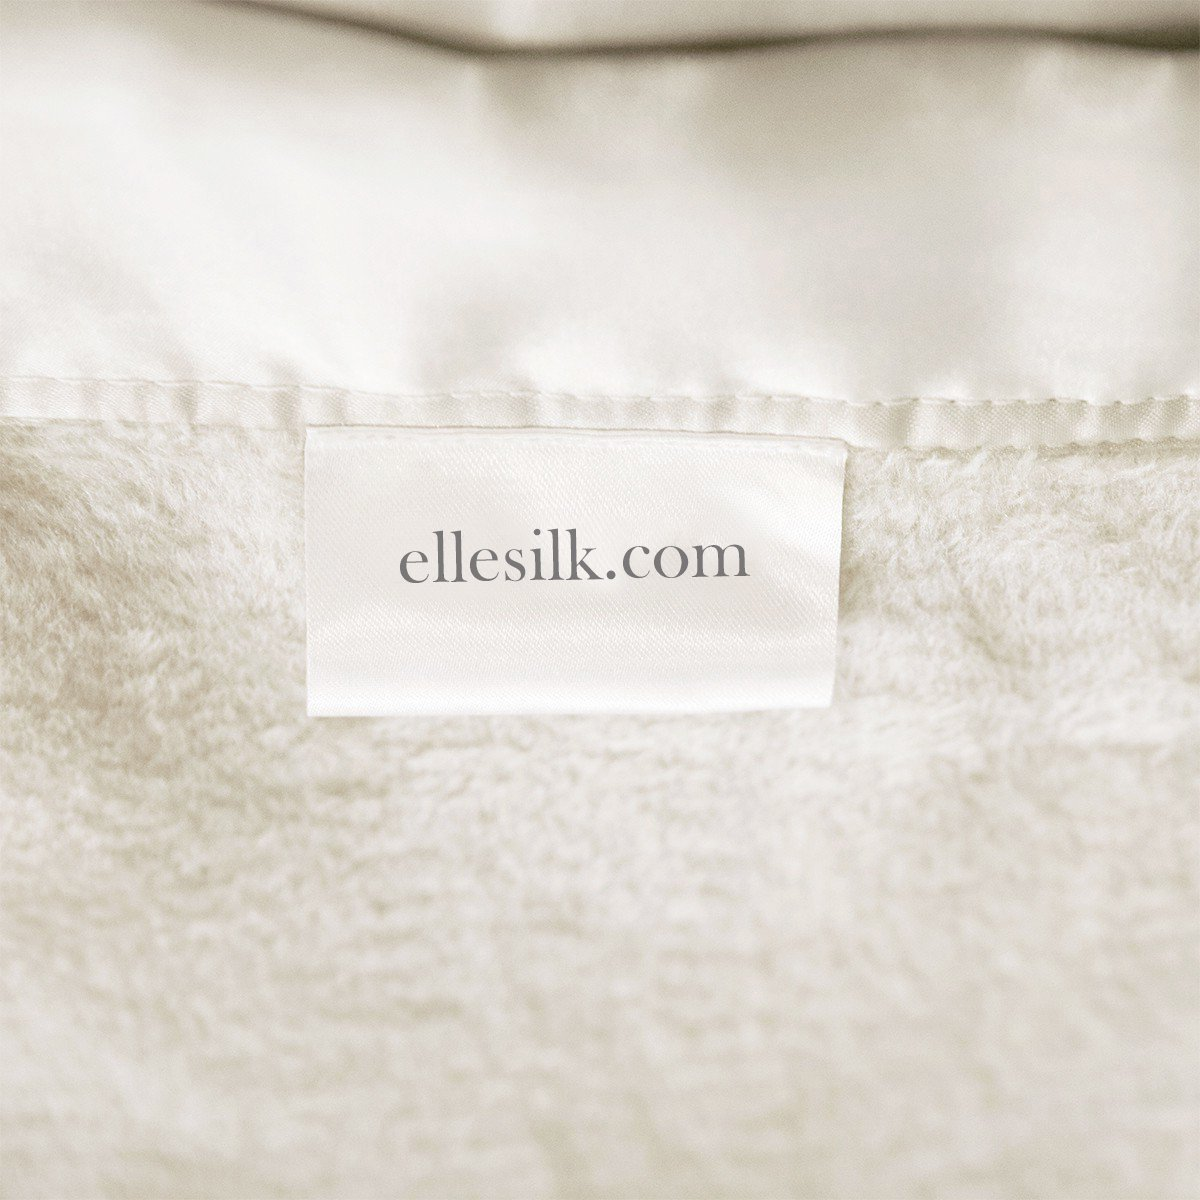 ELLESILK Silk Blanket, Premium Quality 100% Long Strand Mulberry Silk, Sumptuously Soft, Hypoallergenic, Ivory, King